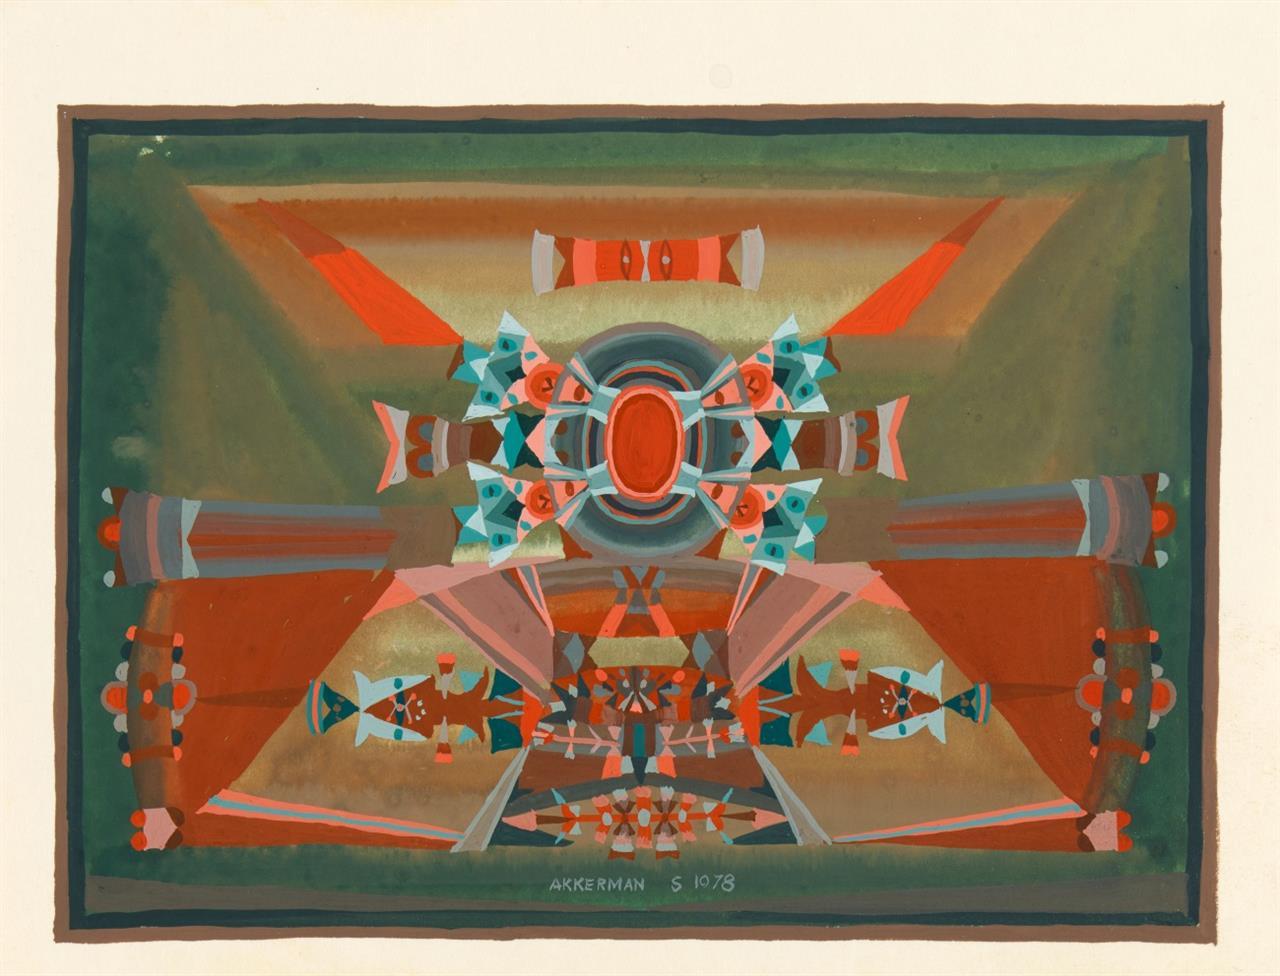 Samuel Akkerman. Ohne Titel (Komposition). 1978. Gouache. Signiert.